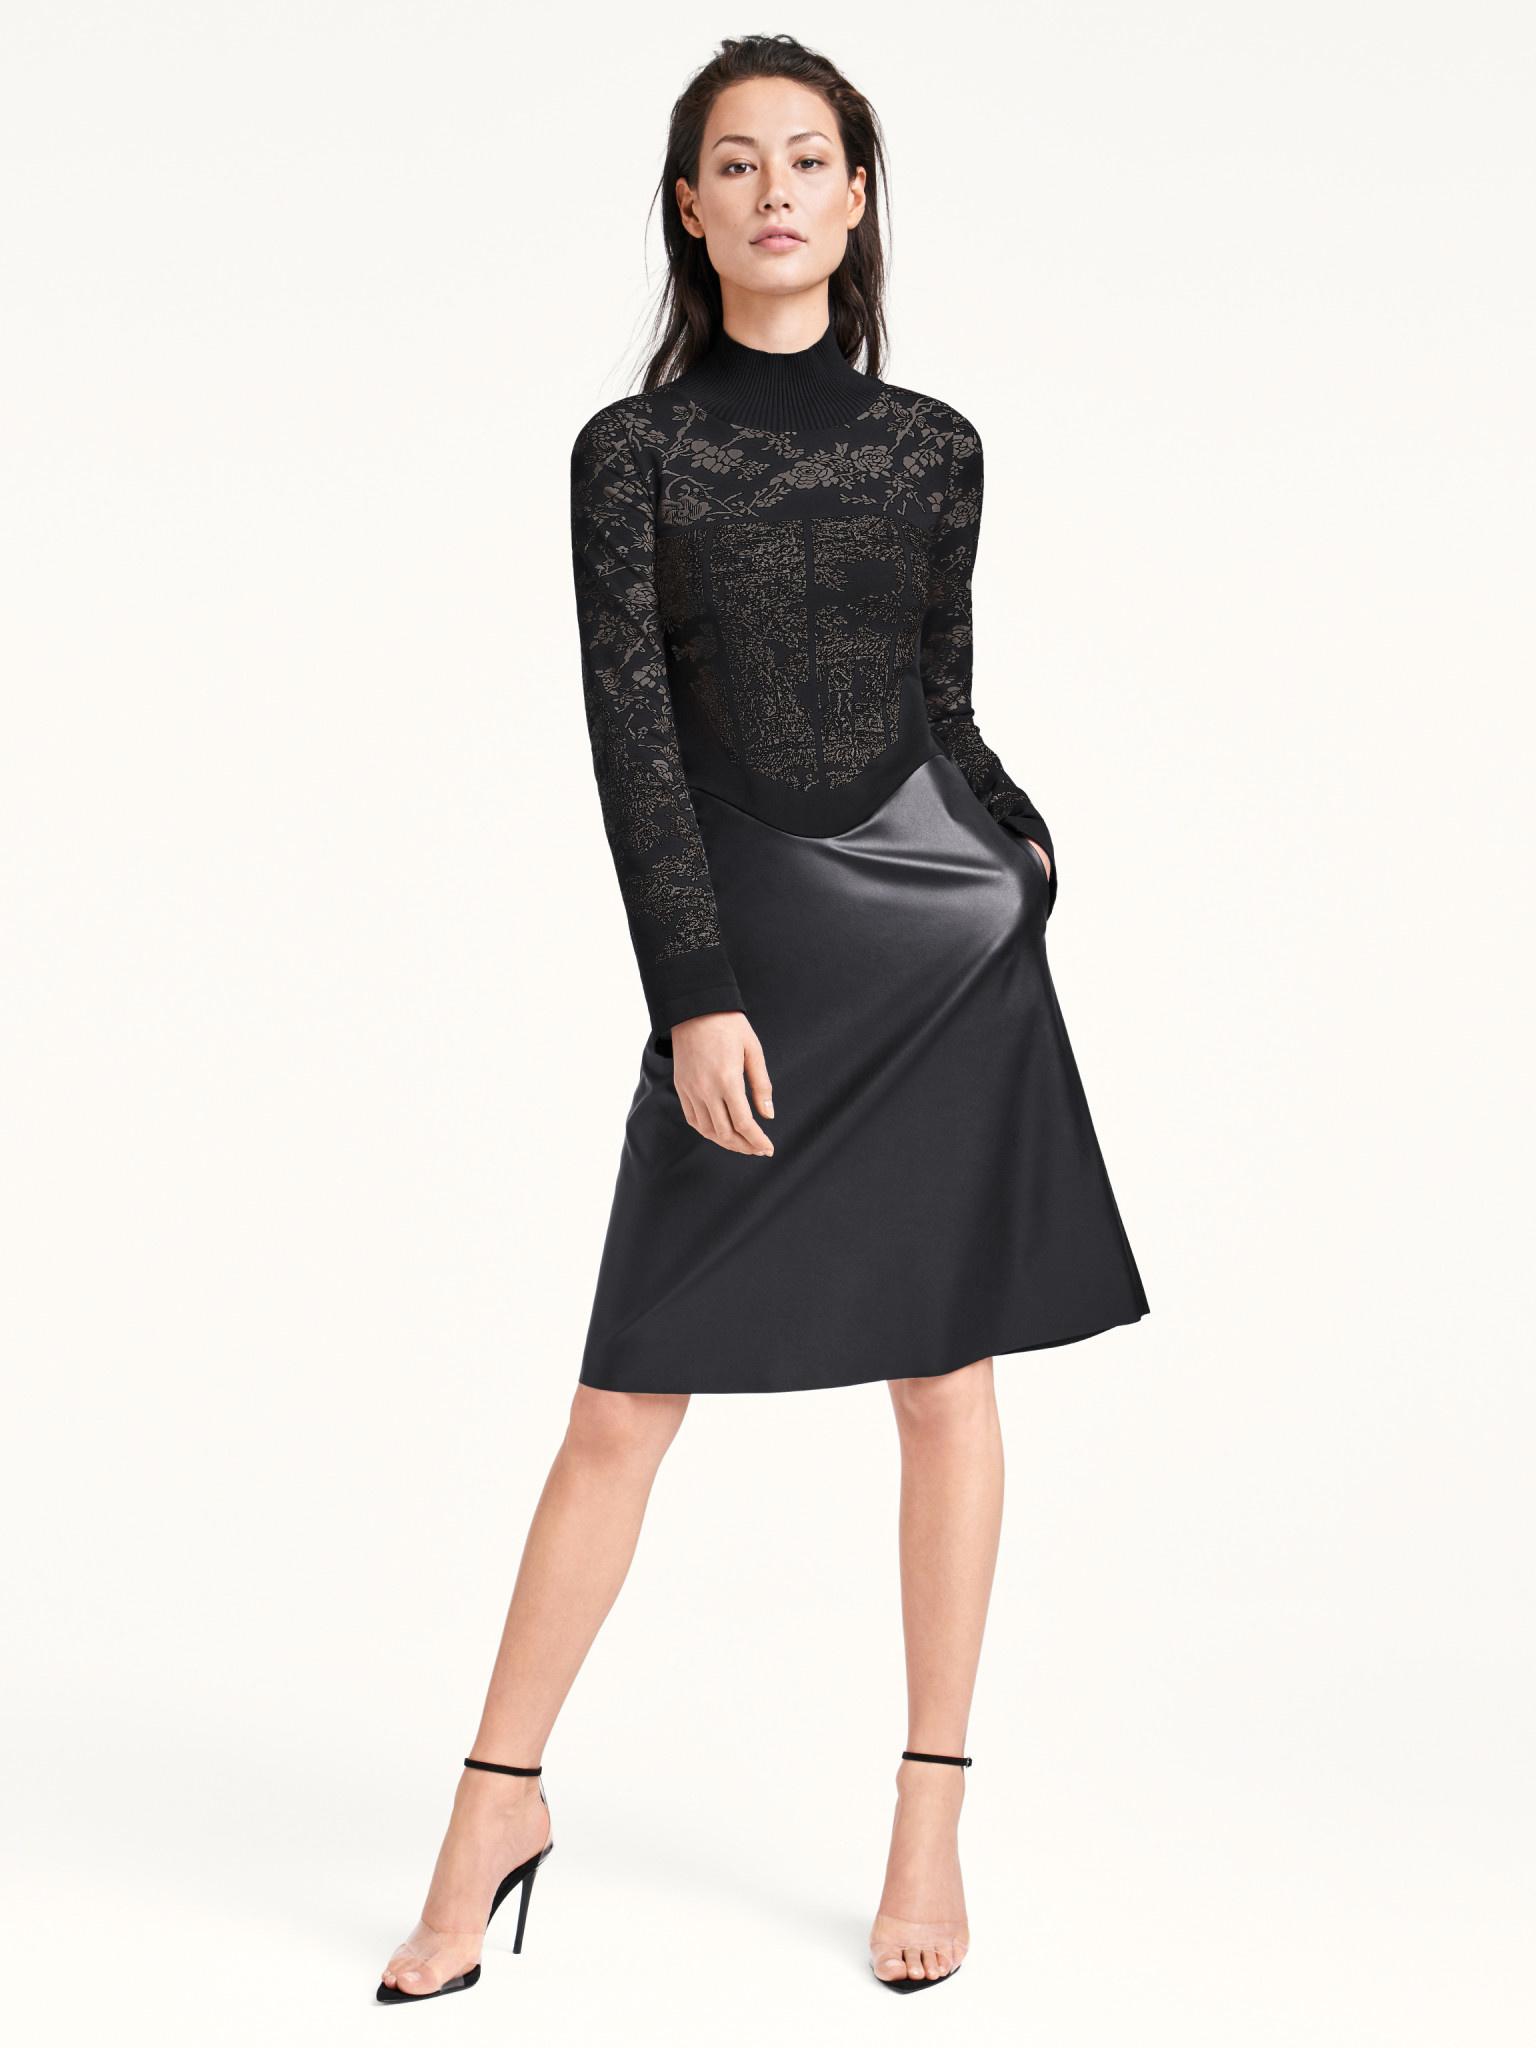 WOLFORD 55571 Johanna Dress Small